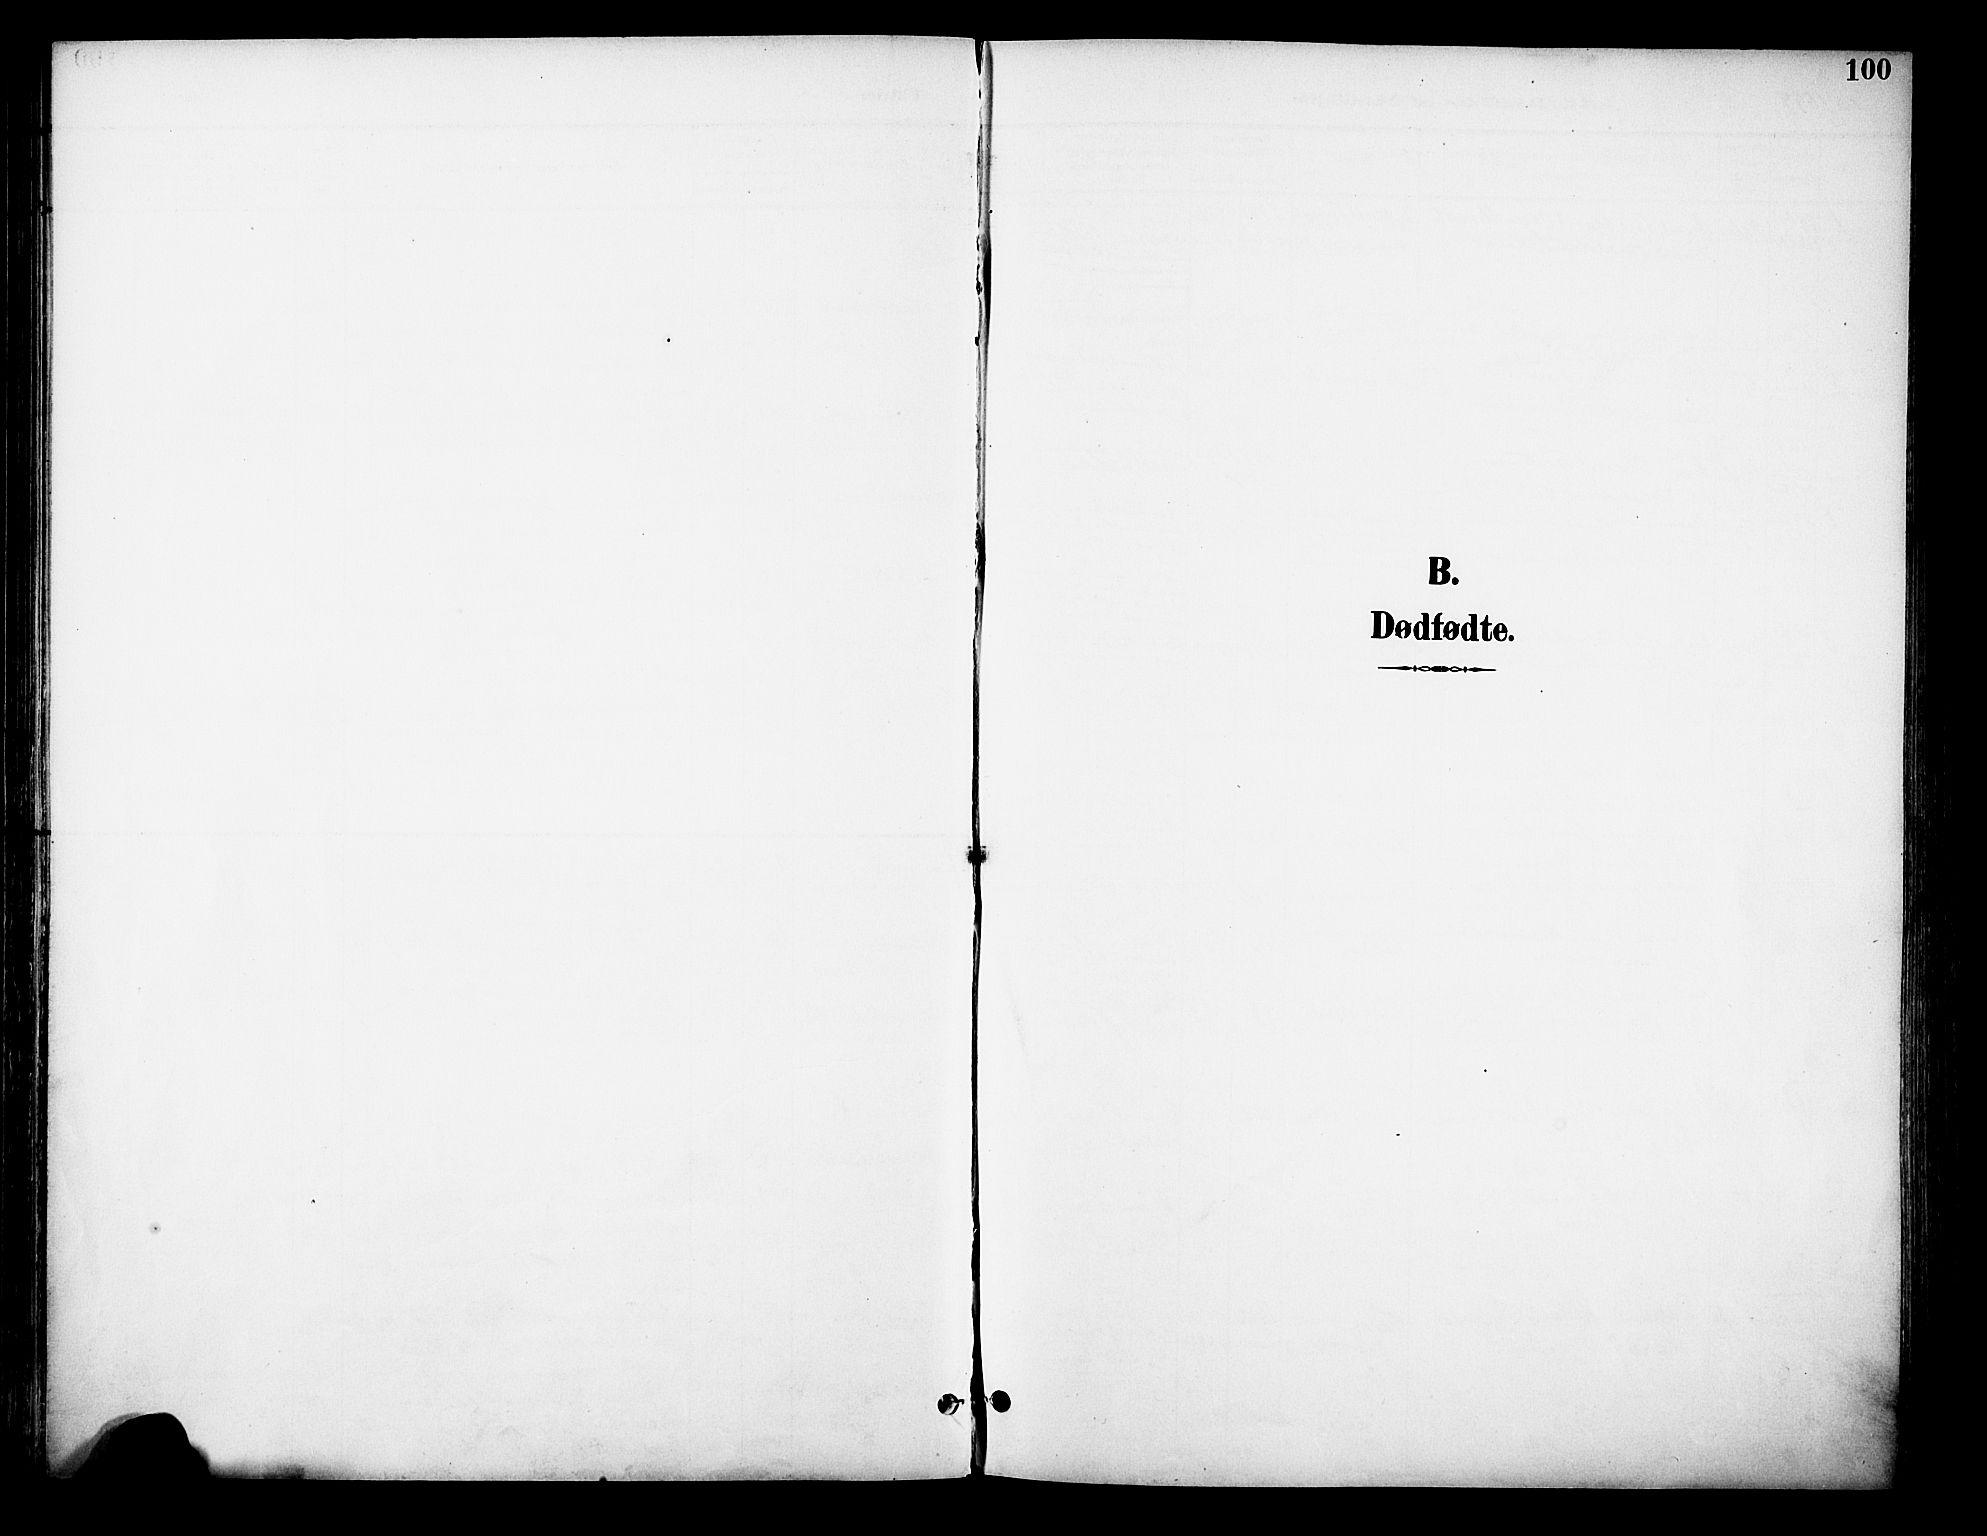 SAH, Østre Toten prestekontor, Ministerialbok nr. 9, 1897-1913, s. 100